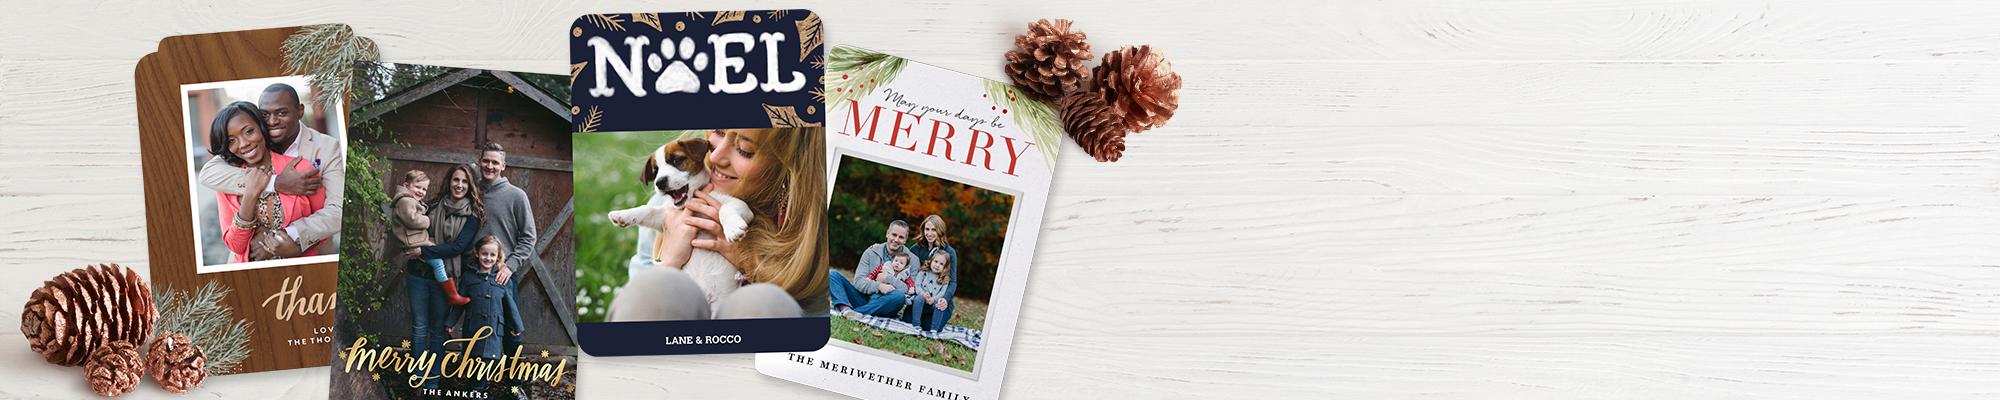 Australian Christmas Cards Free Download.Photo Cards Personalized Cards Christmas Cards Holiday